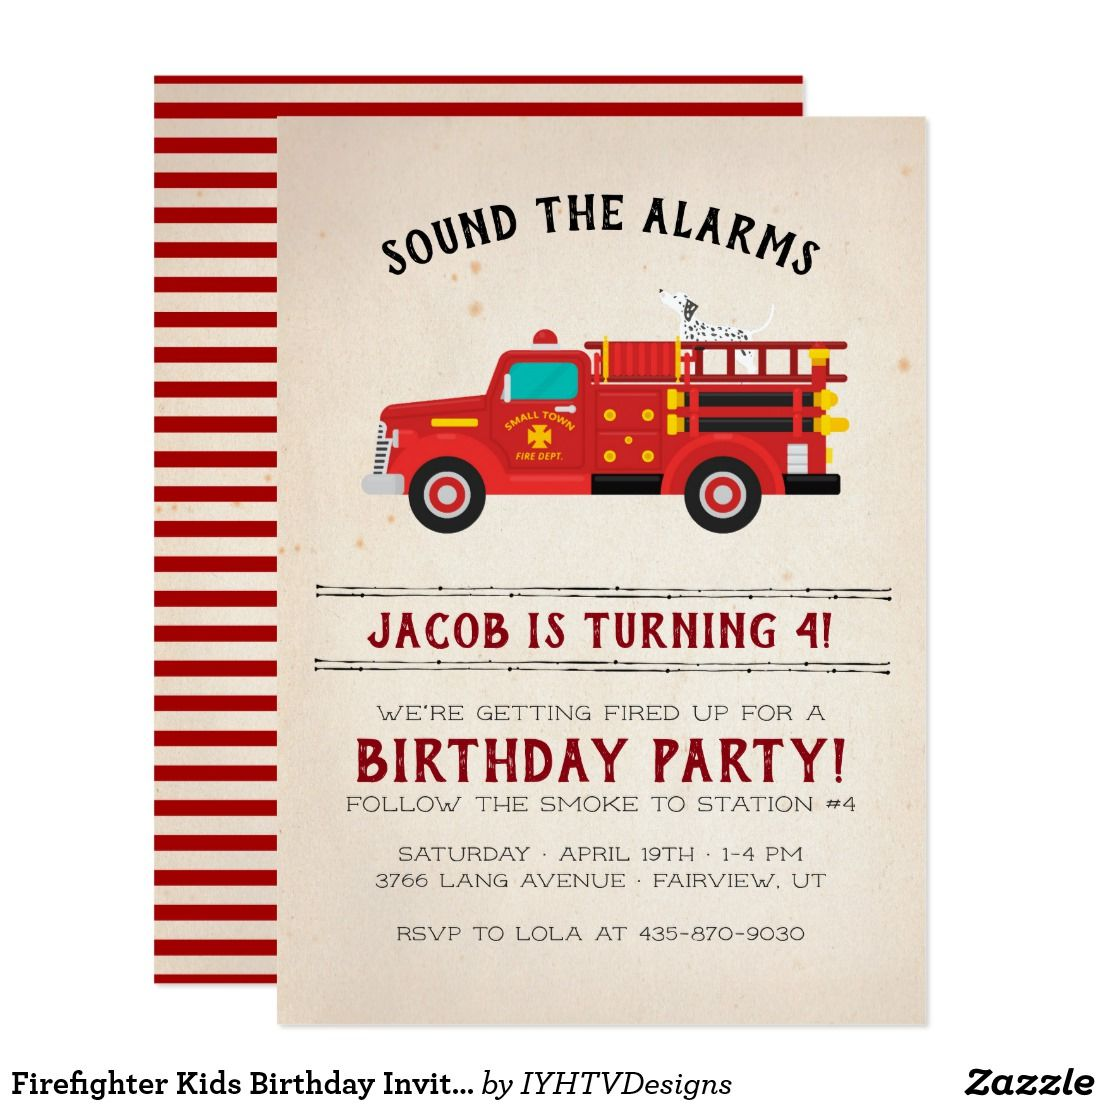 Firefighter Kids Birthday Invitation